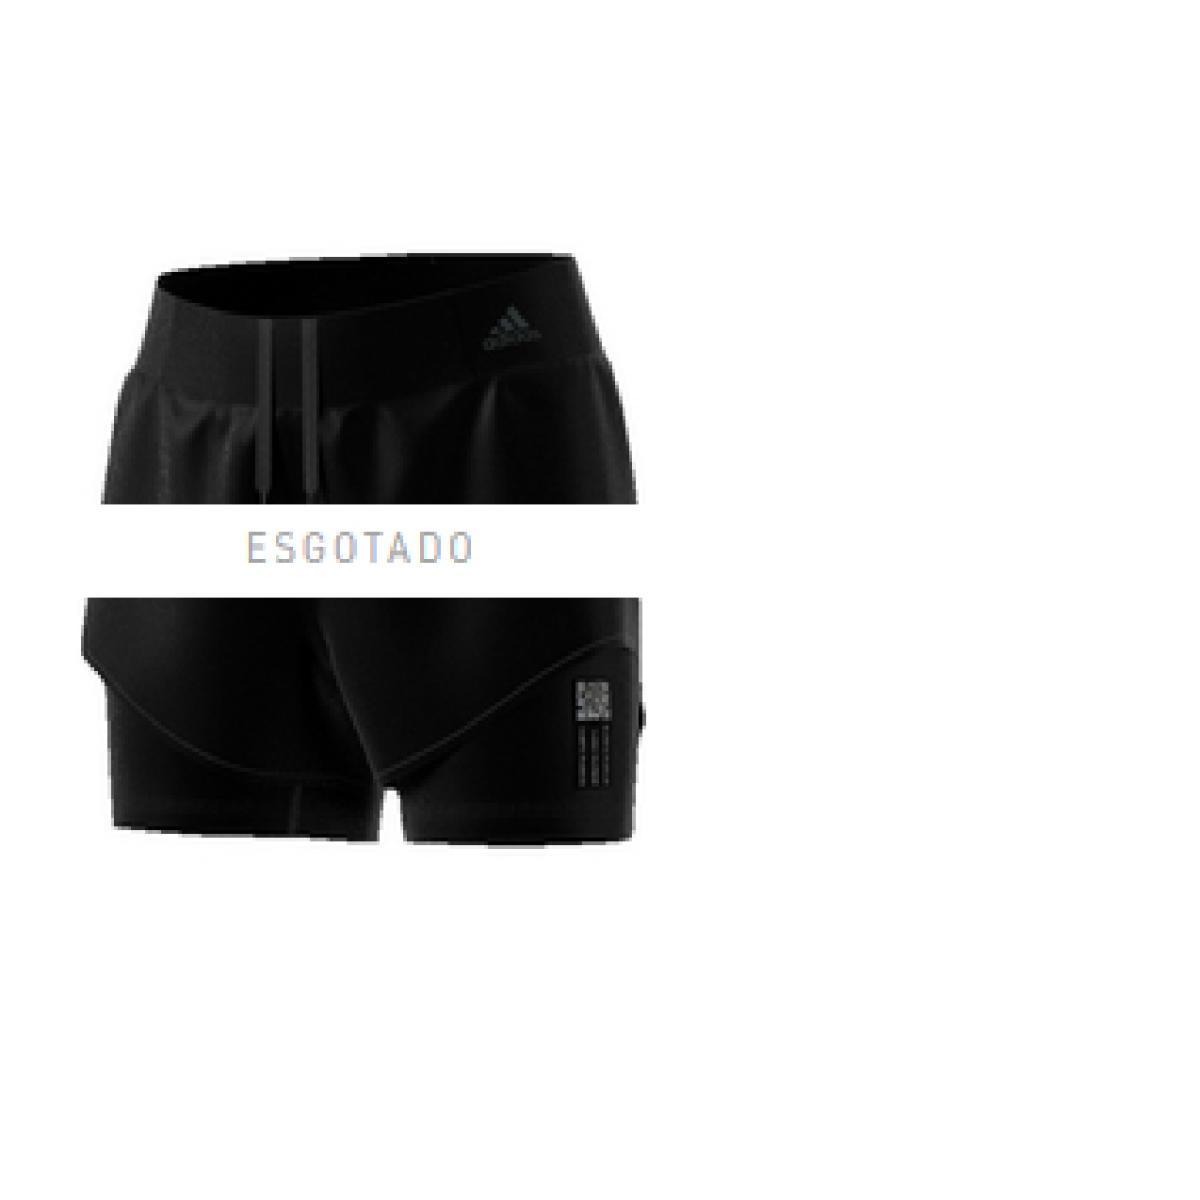 Feminino Adidas Dw7822 Adapt Short w Preto